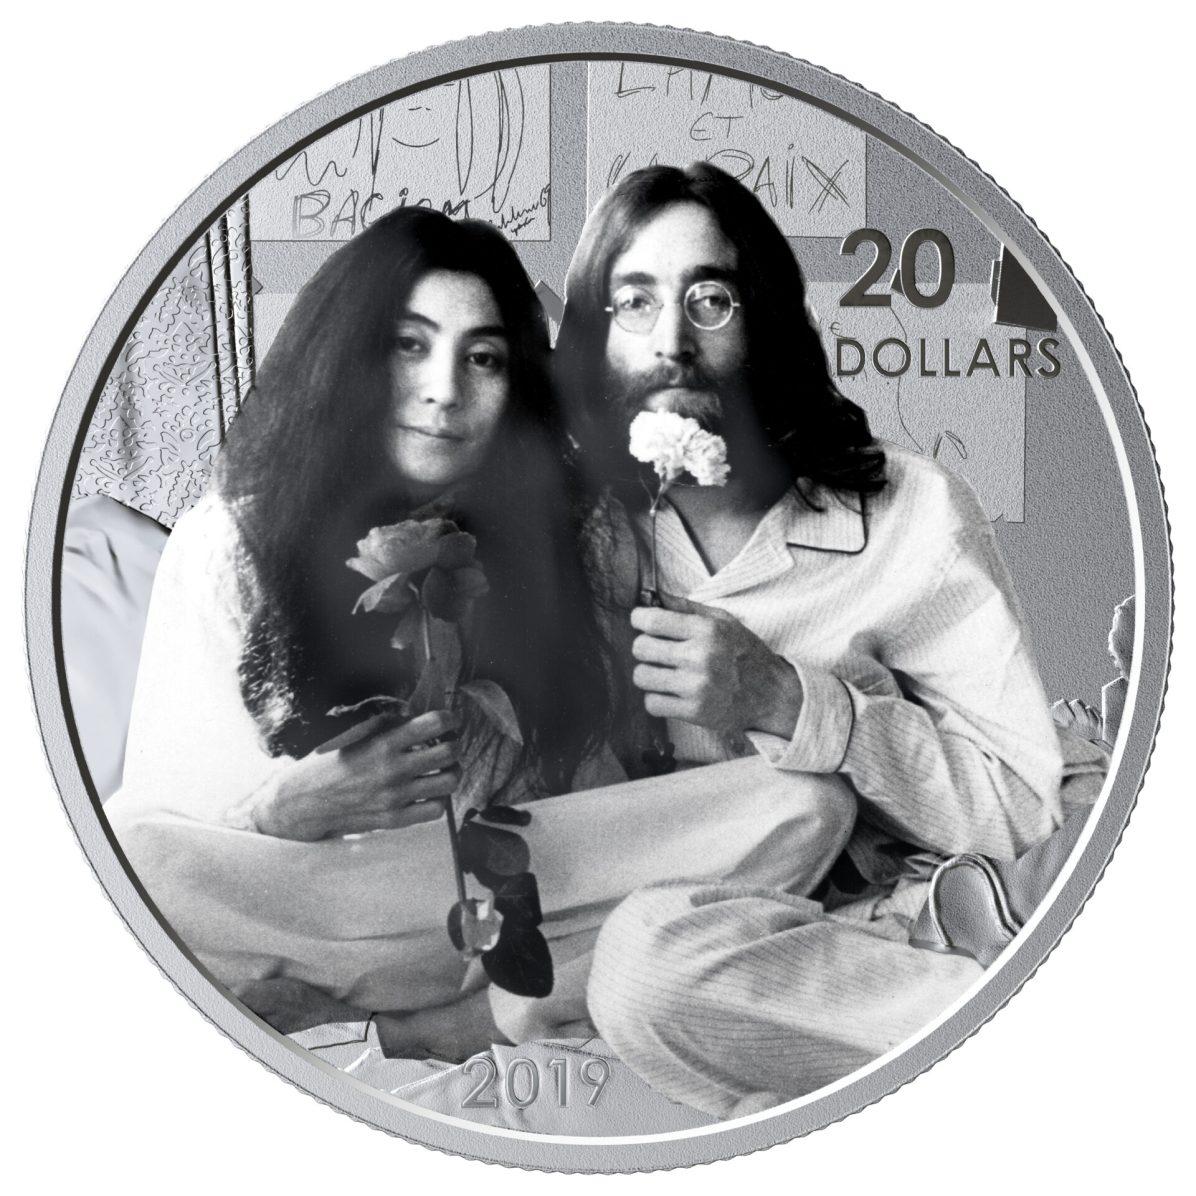 2019 $20 Fine Silver Coin - Give Peace a Chance 50th Anniversary REV